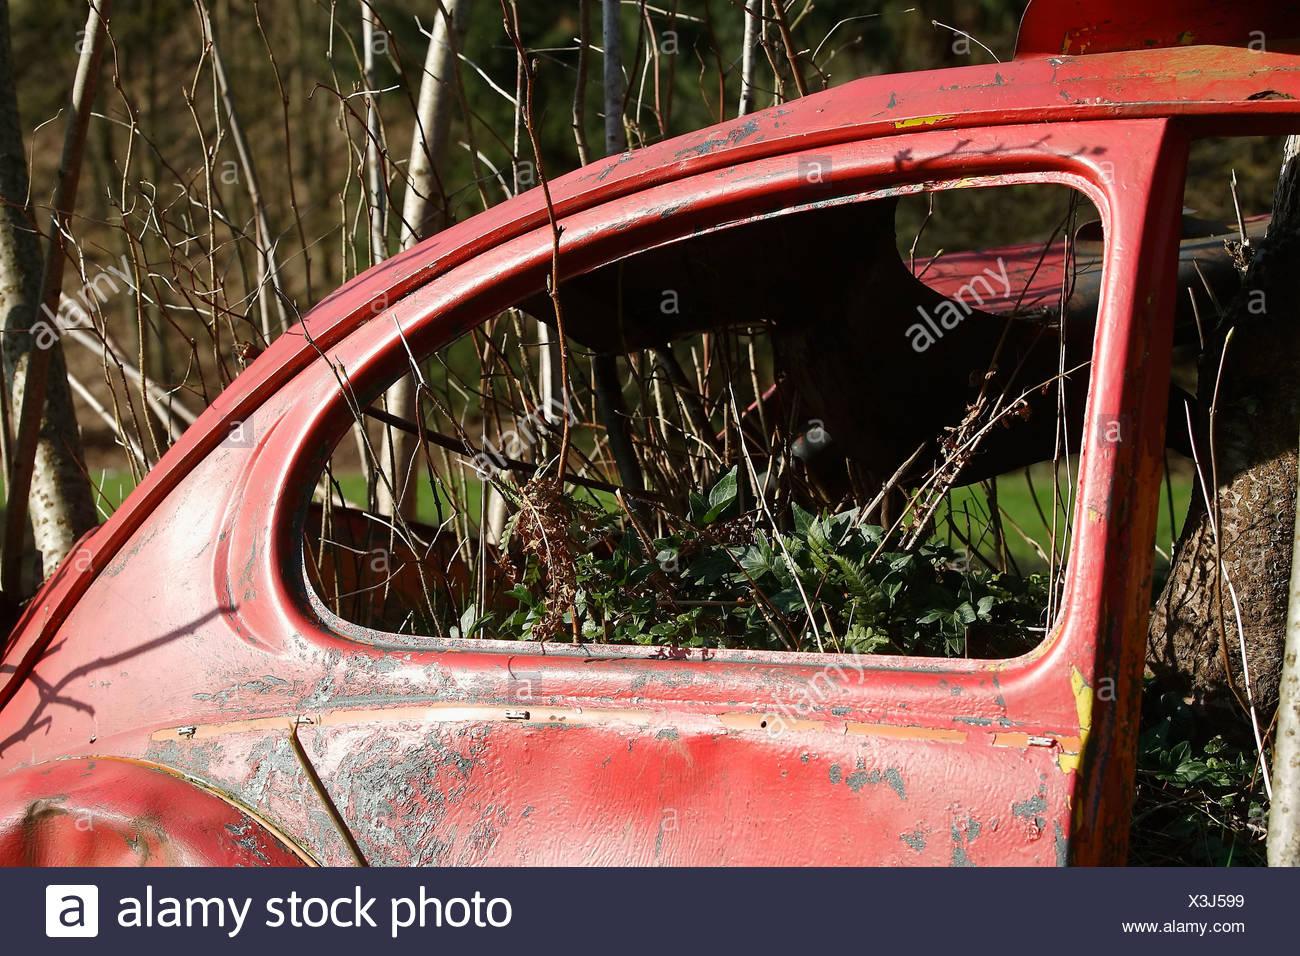 Old Volkswagen beetle overgrown by plants Stock Photo